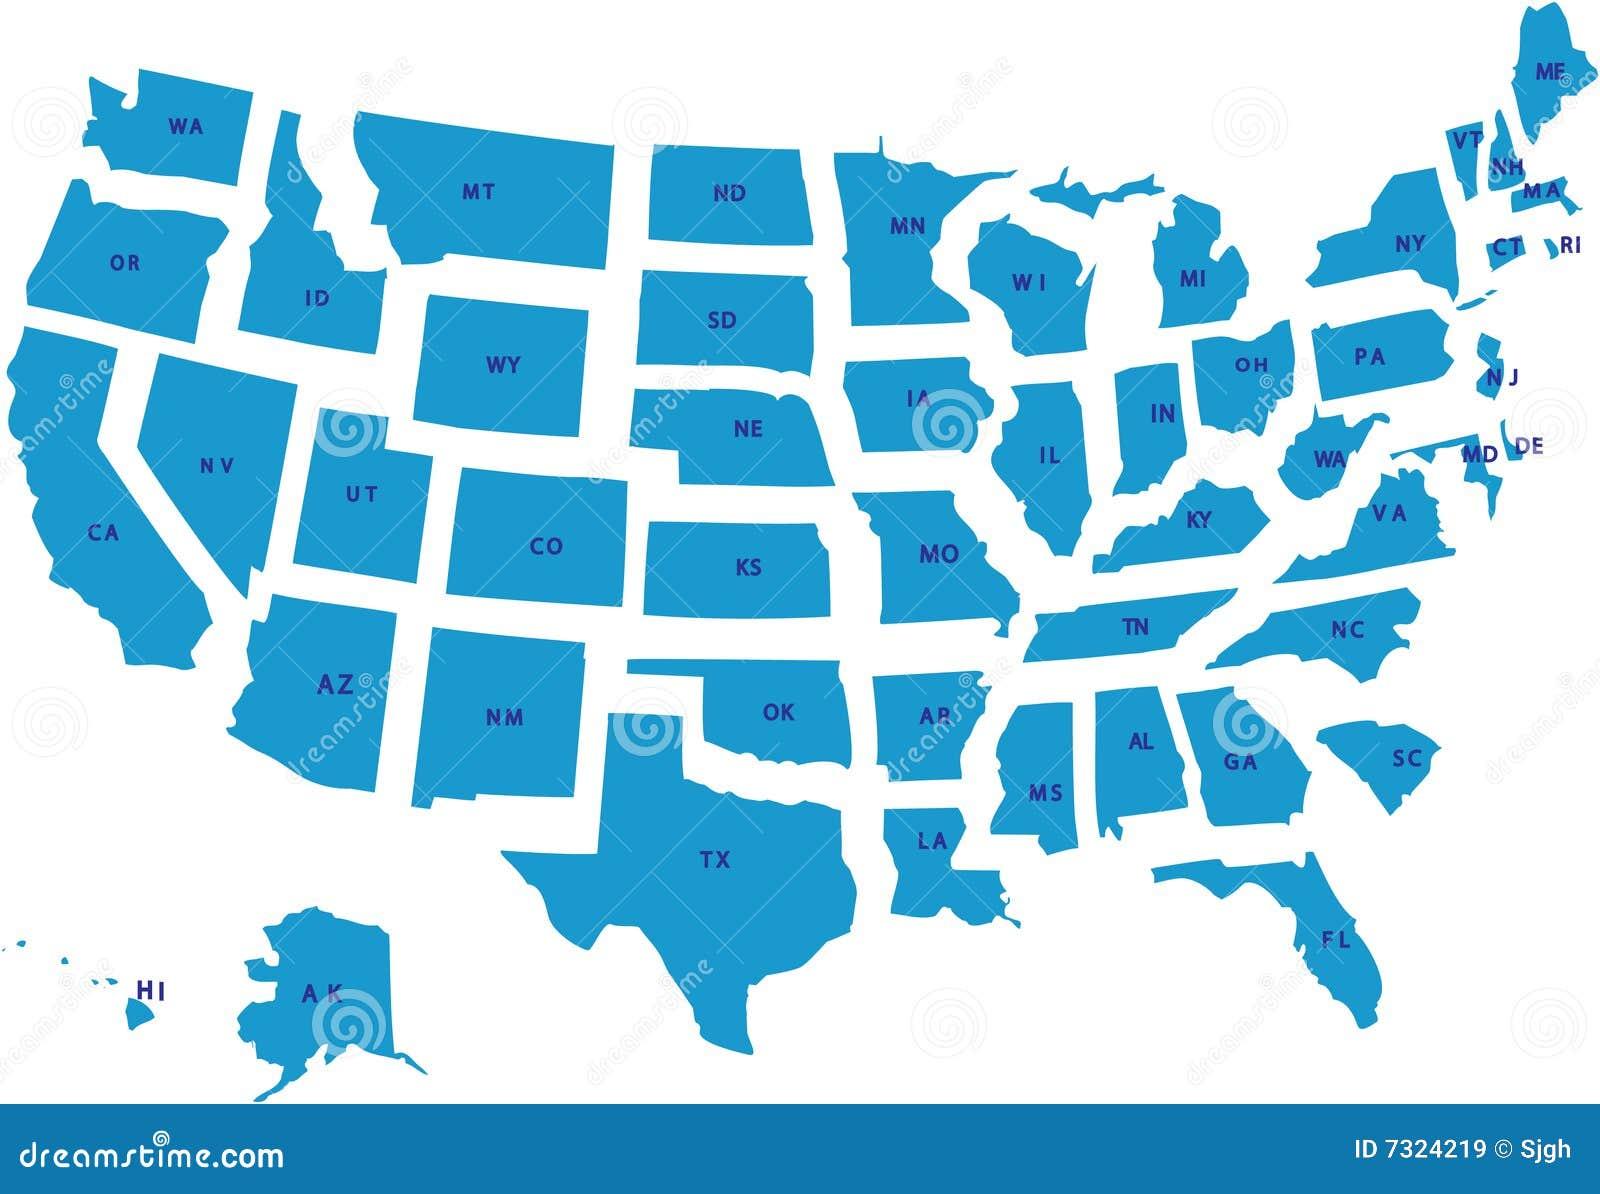 USA Map For PowerPoint Keynote Presentation Shop USA Map Keynote - Us map keynote